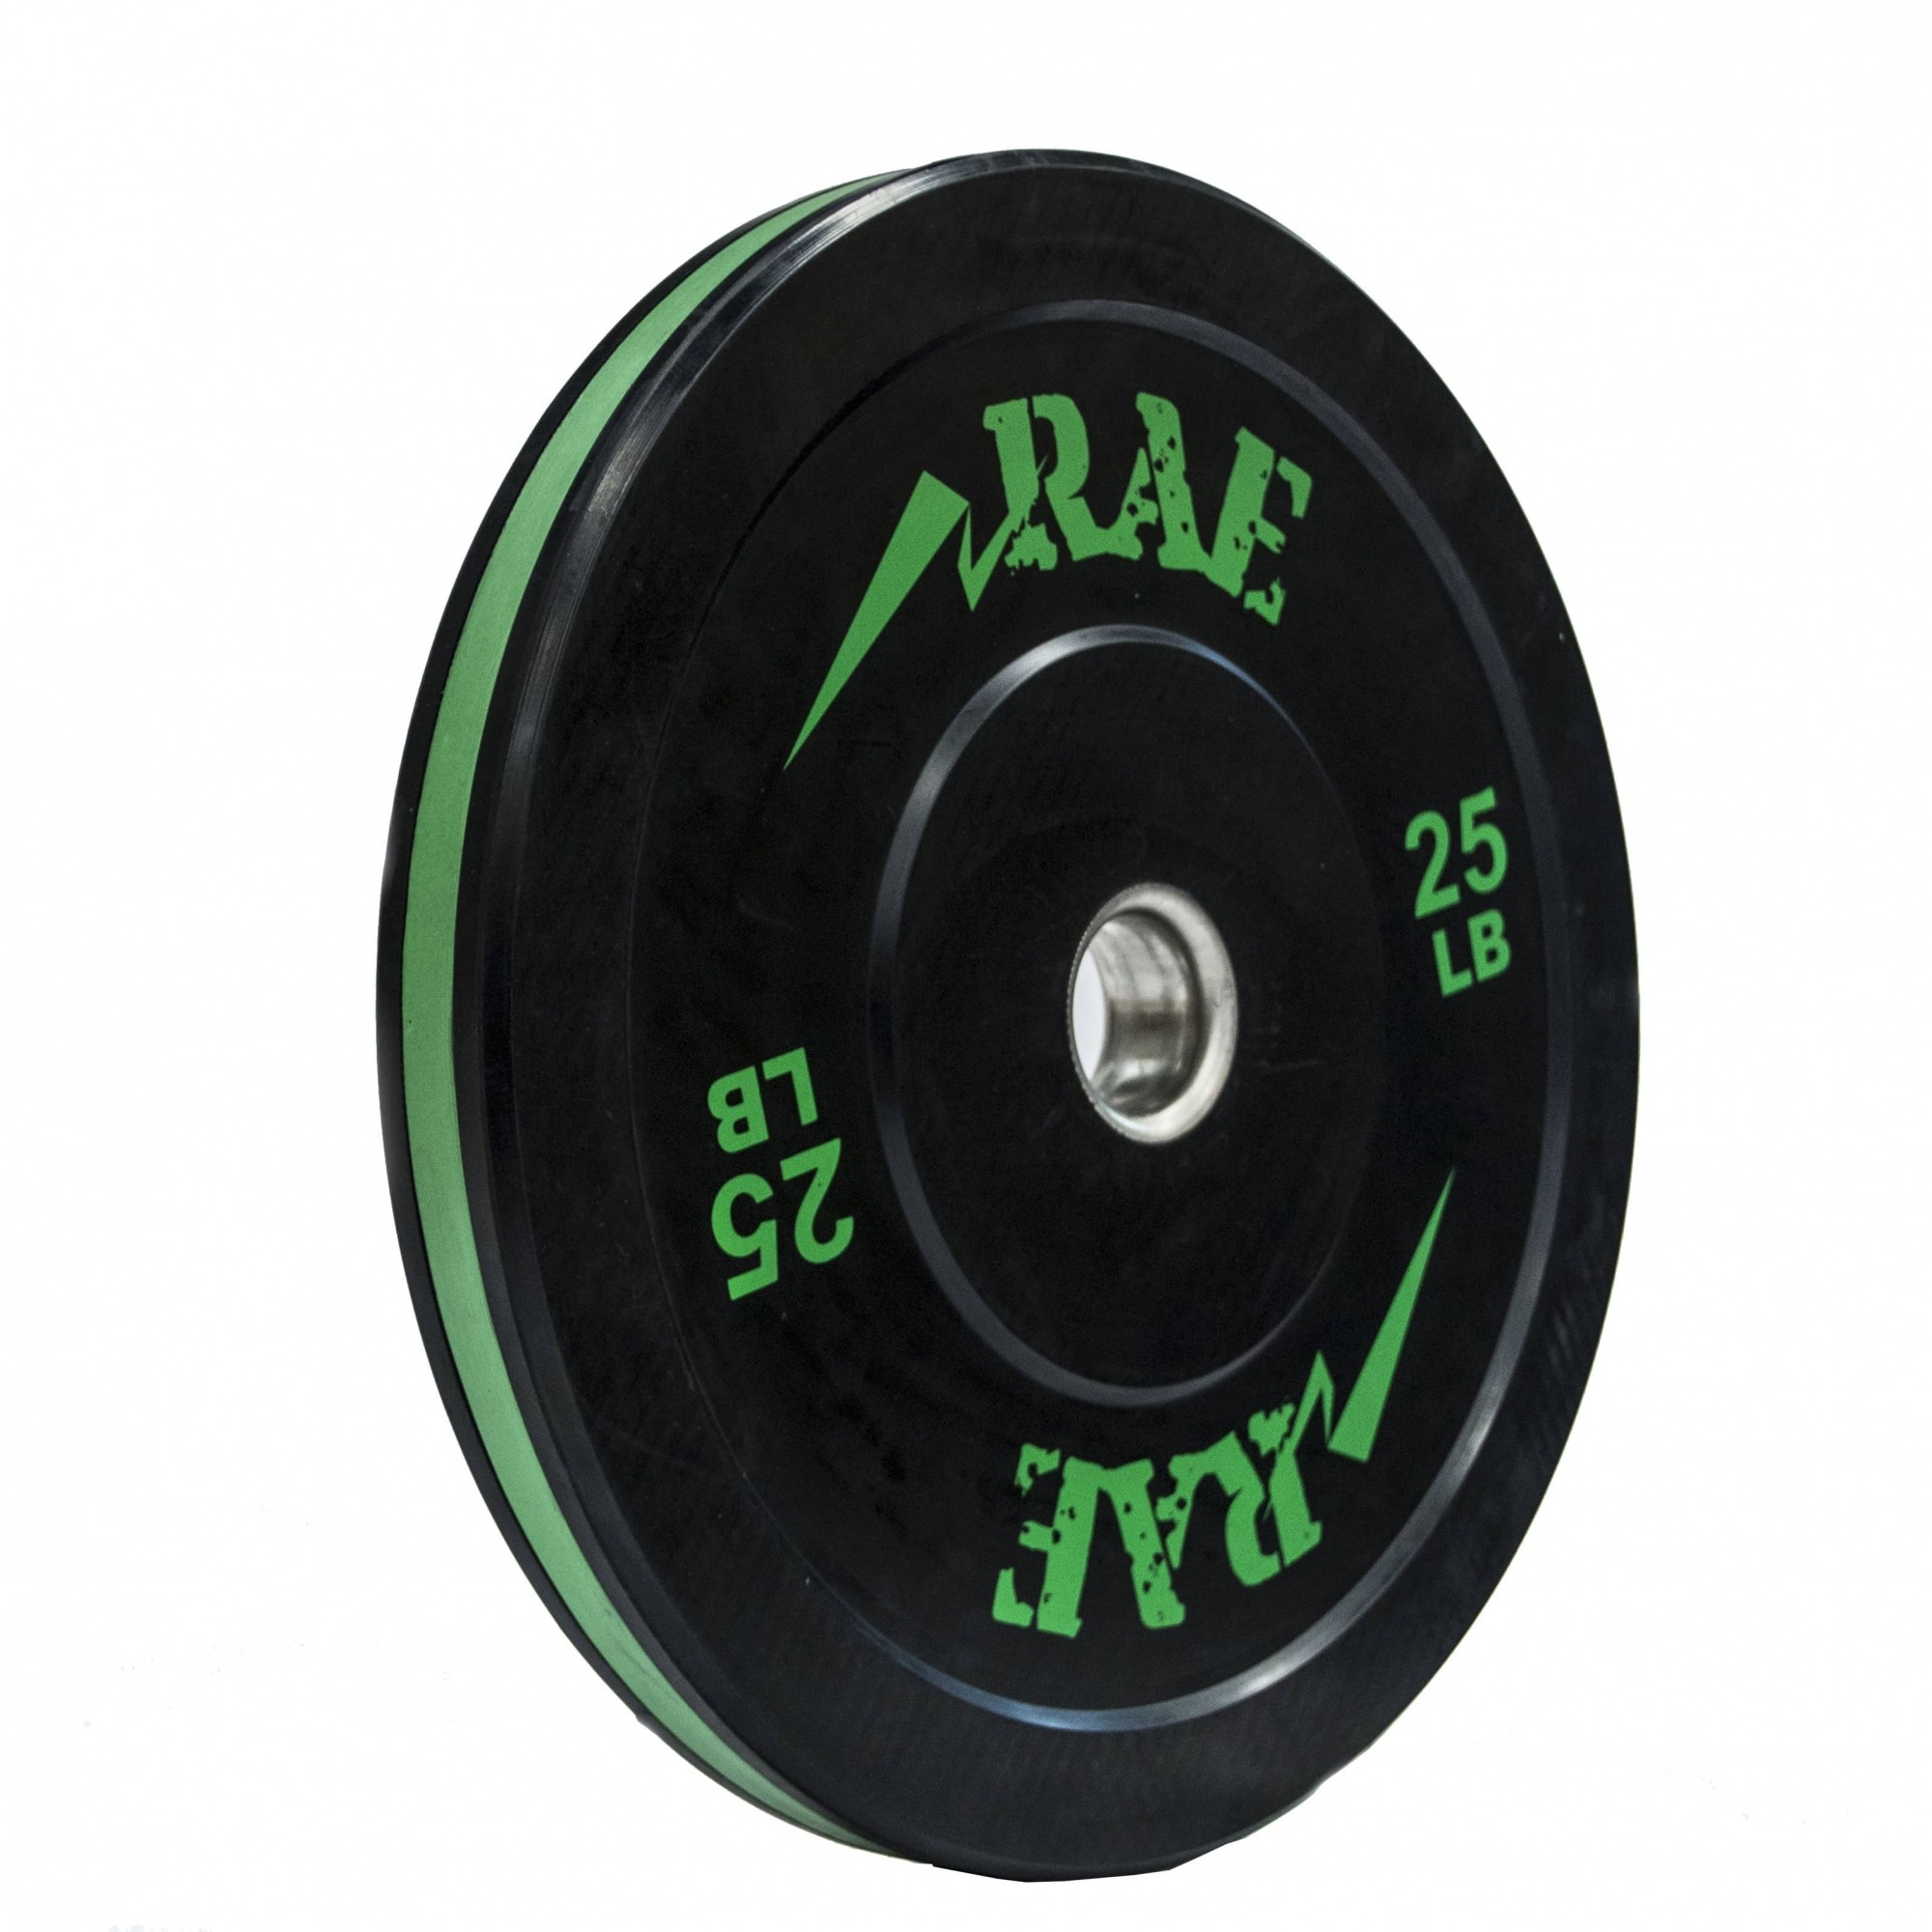 Anilha Olímpica Bumper Seminova - Rae Action 25 lb - Rae Fitness